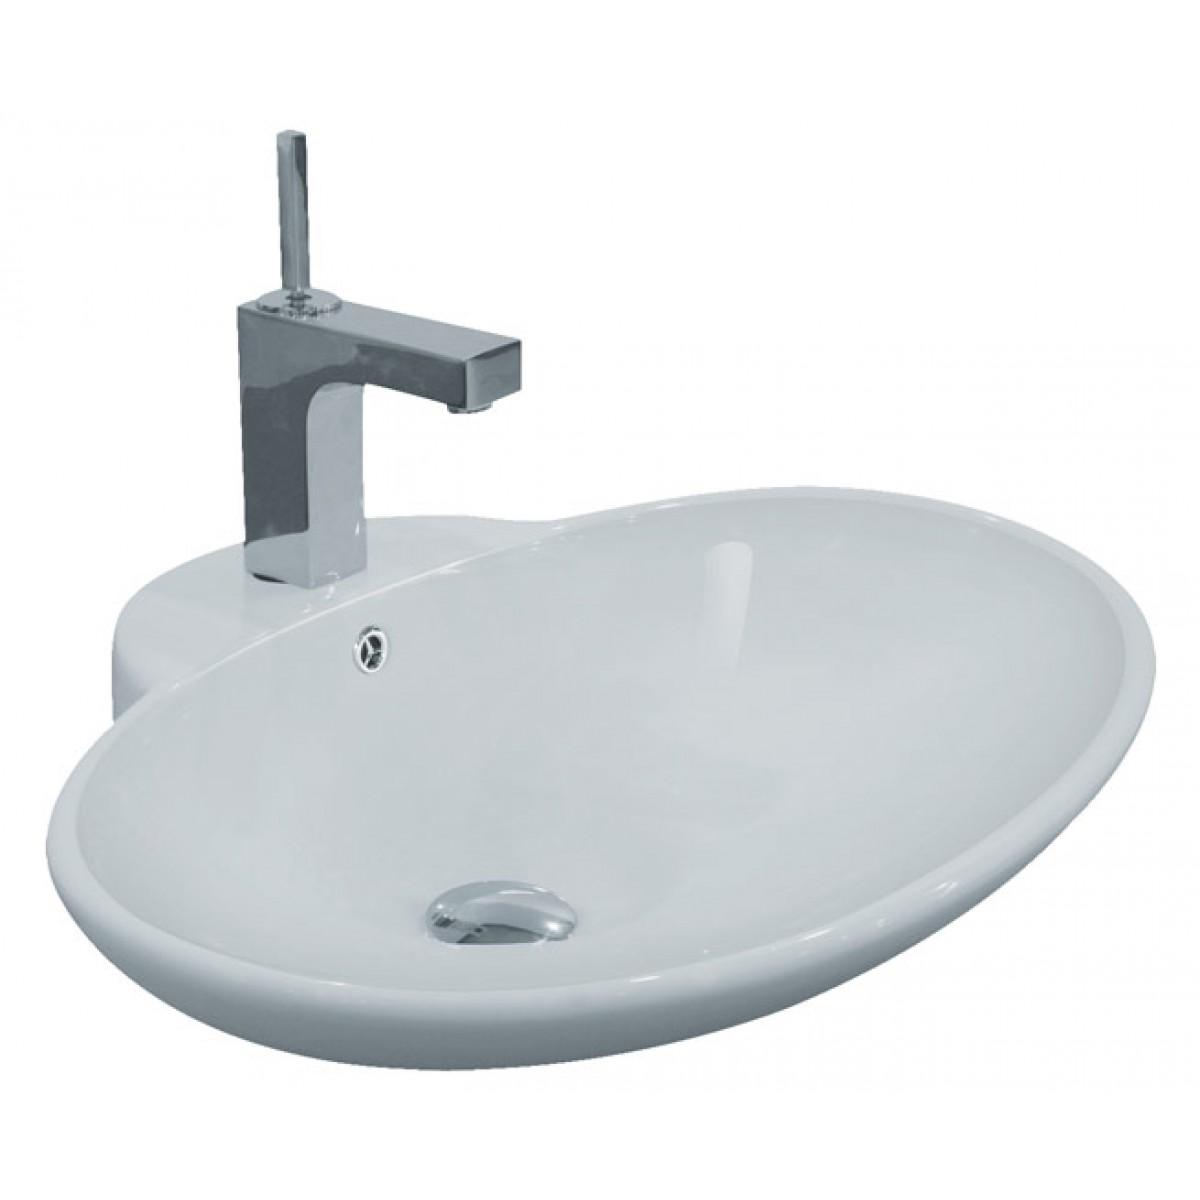 Porcelain Ceramic Single Hole Countertop Bathroom Vessel Sink   24 3/4 X 19 1/4  X 8 Inch